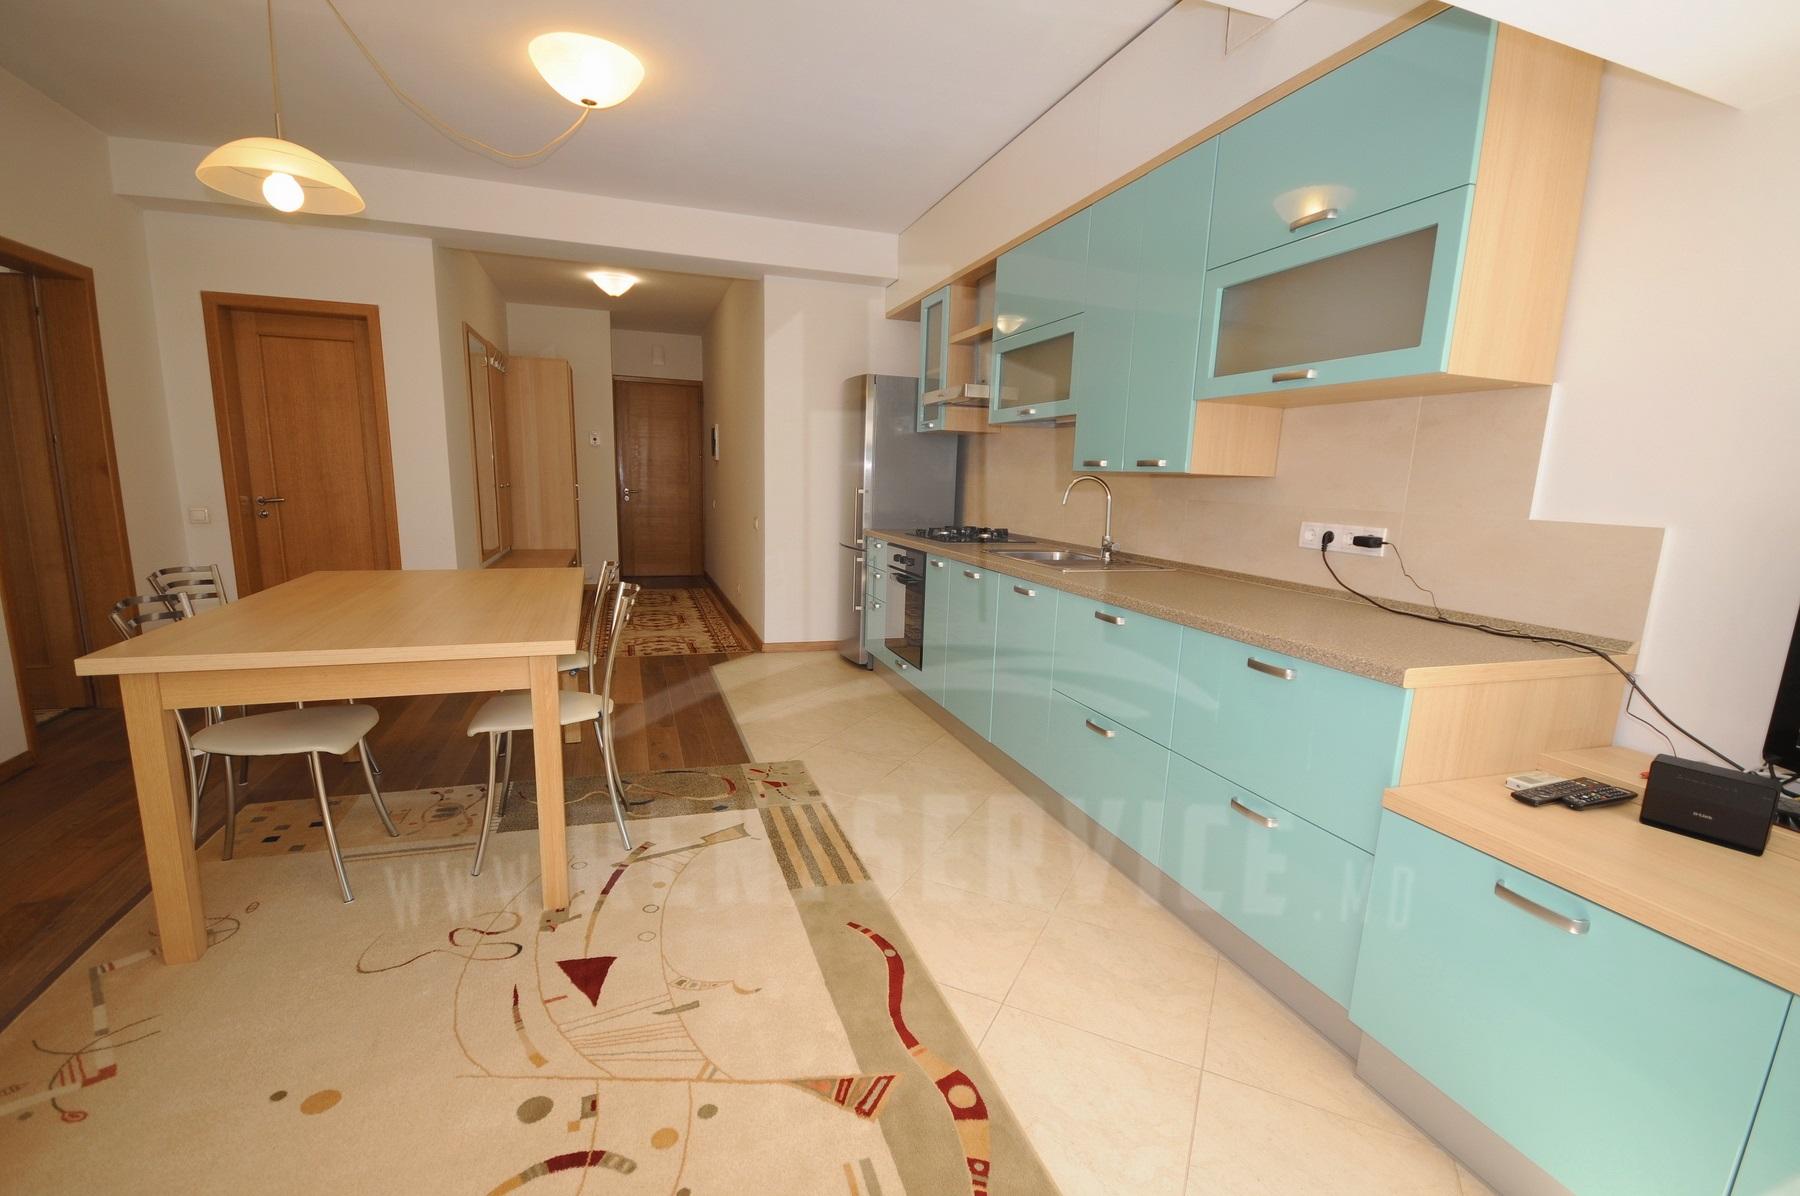 267_apartment_2.JPG